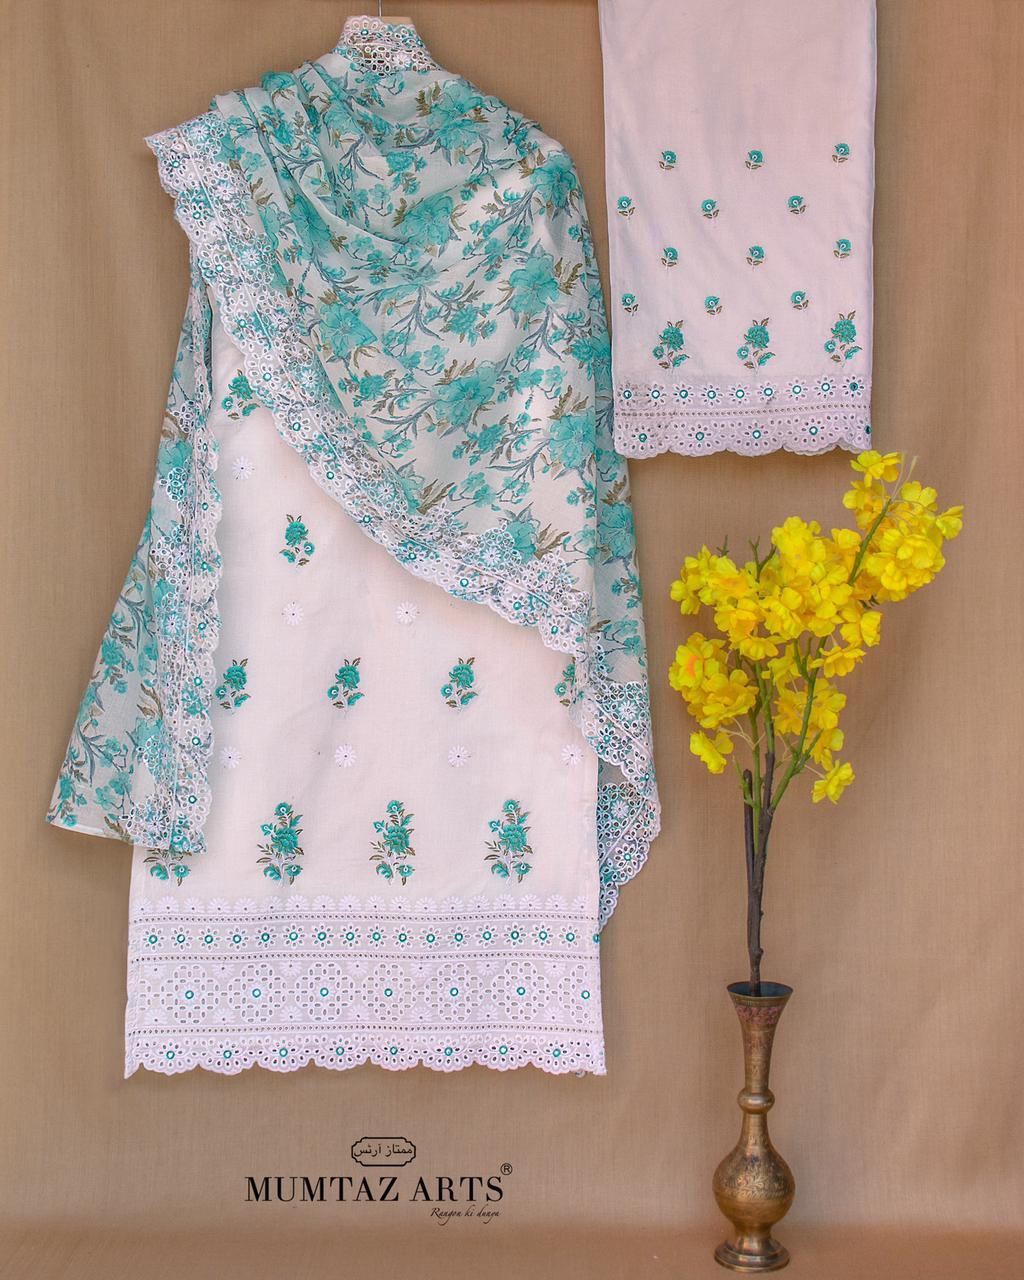 Mumtaz Arts Summer Sunshine 2021 Vol 1 Salwar Suit Wholesale Catalog 4 Pcs 10 - Mumtaz Arts Summer Sunshine 2021 Vol 1 Salwar Suit Wholesale Catalog 4 Pcs